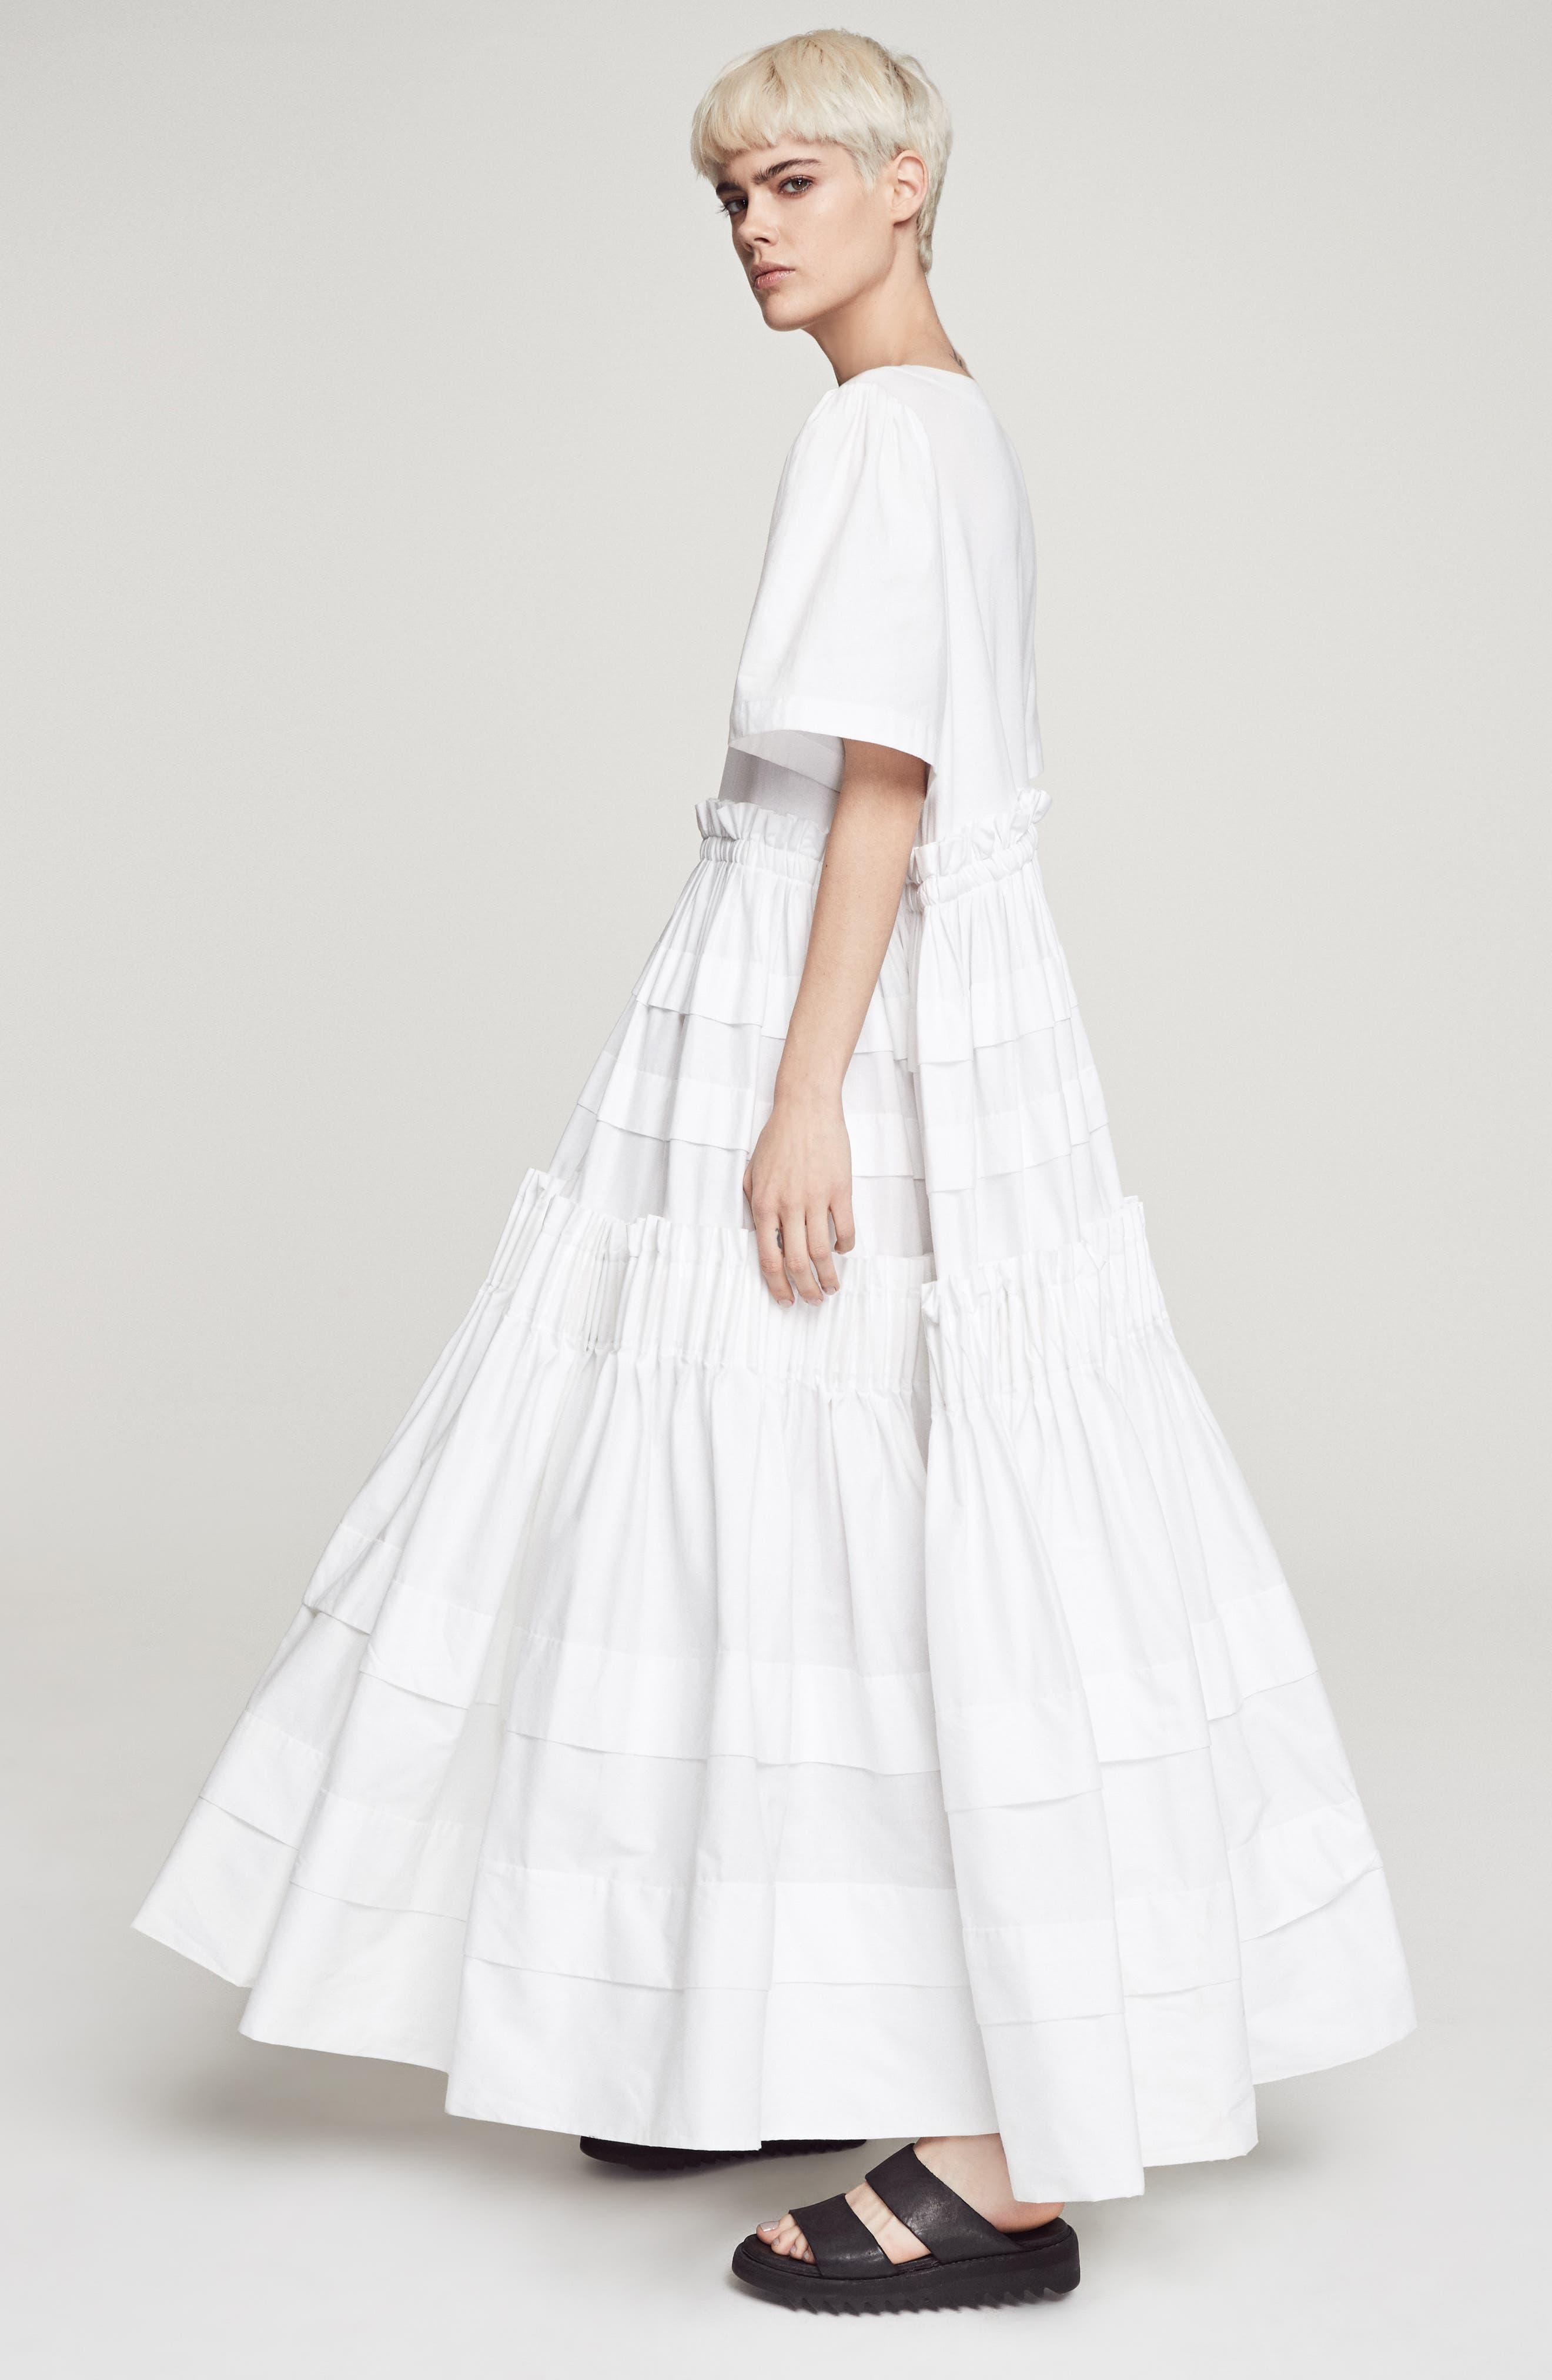 Mathilda Maxi Dress,                             Alternate thumbnail 10, color,                             White